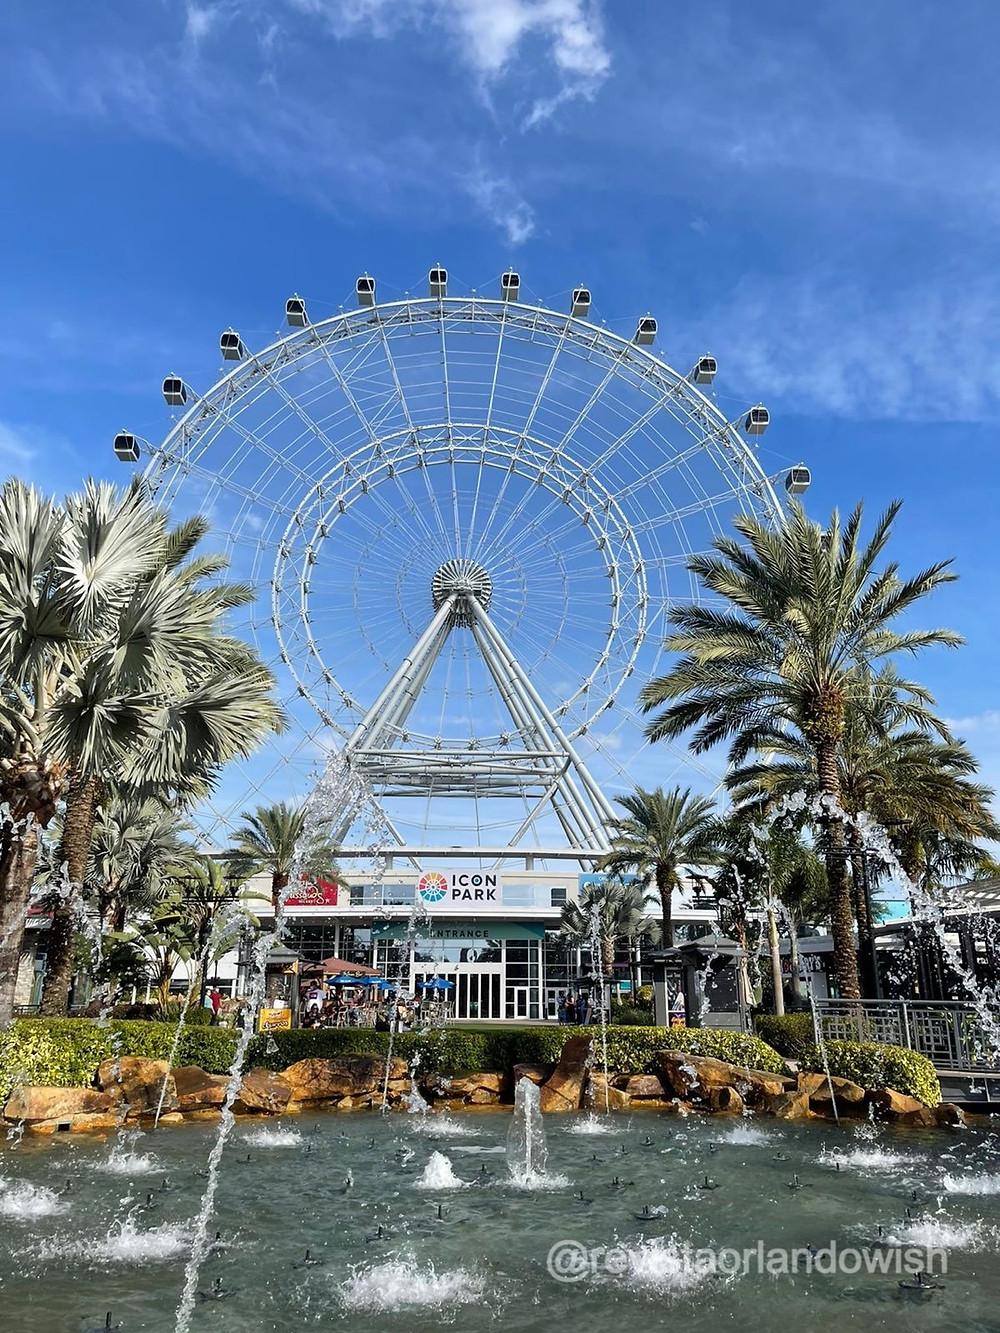 onde fica o Icon Park Orlando?